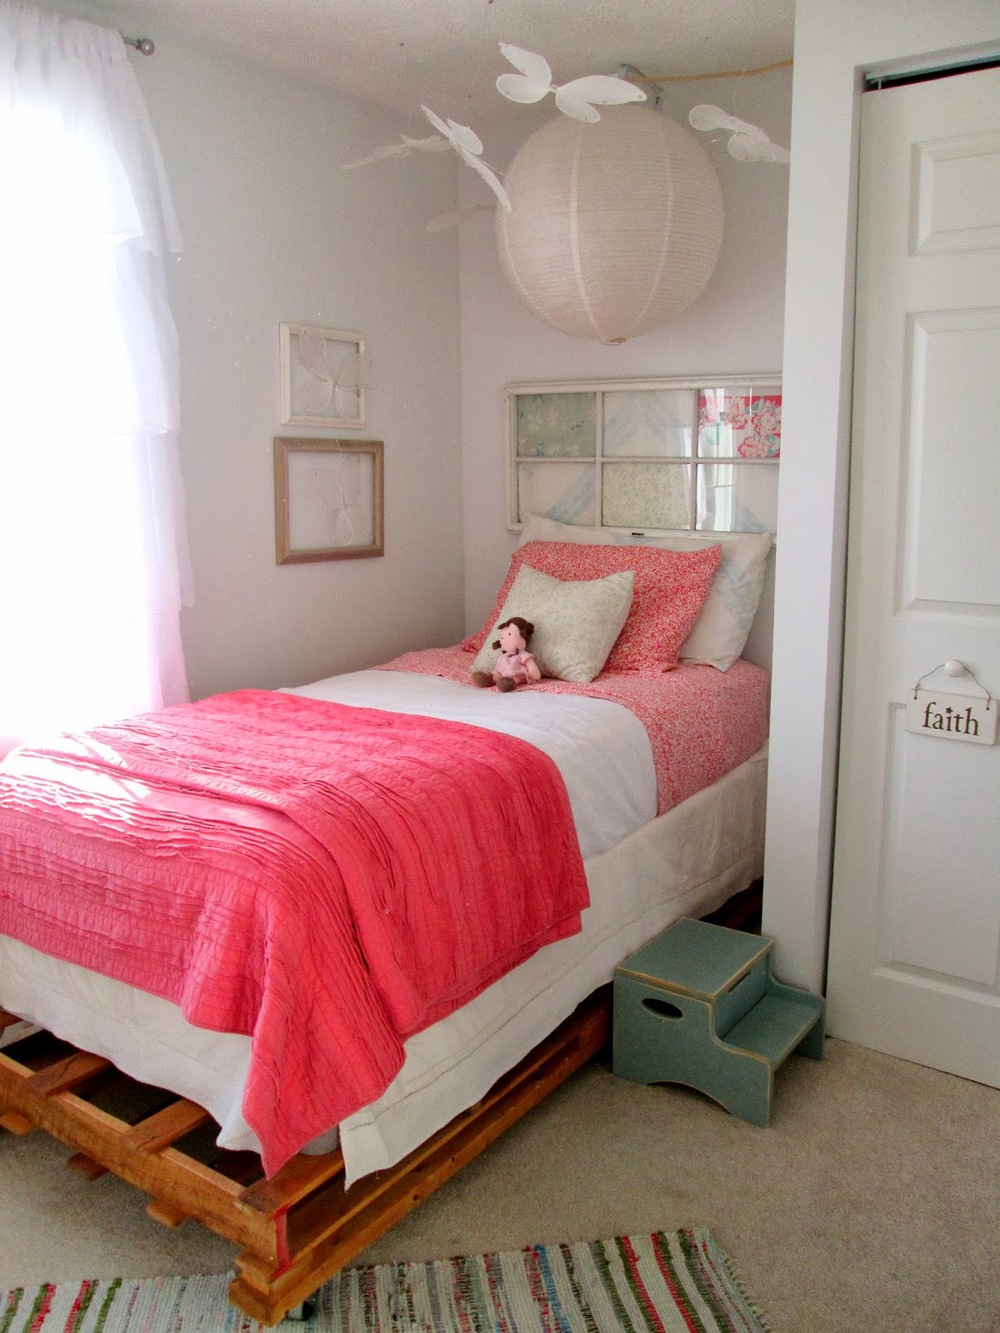 shire+room+redo10.jpg